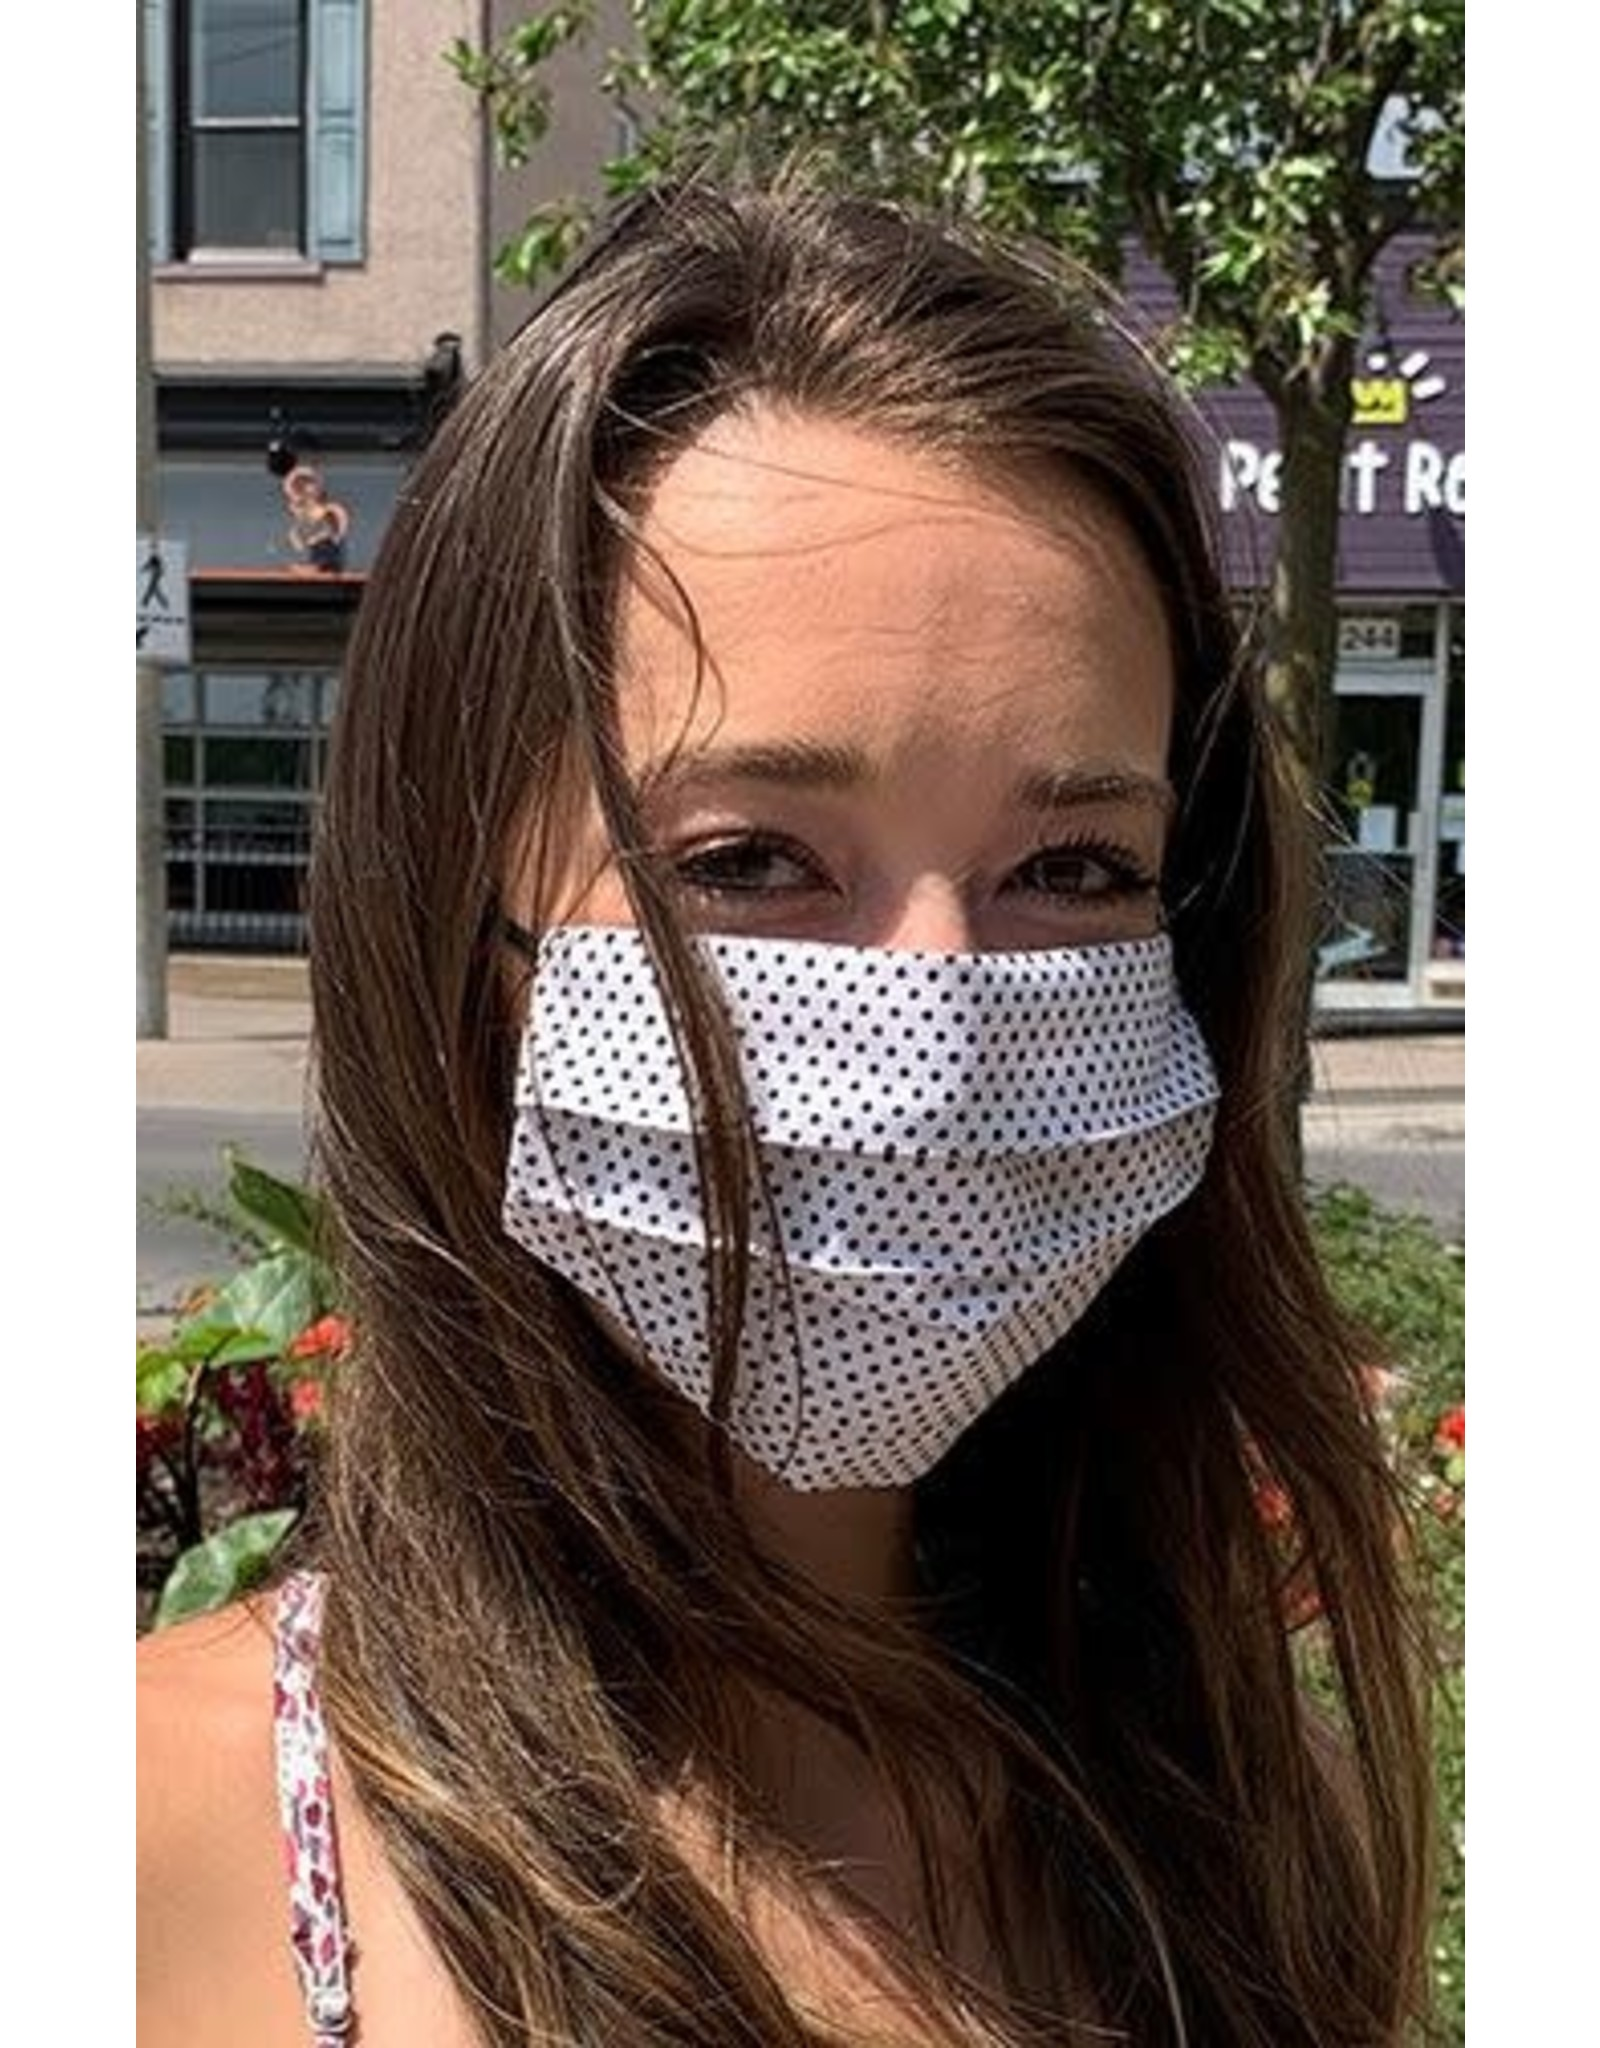 Mondor Junior Cotton Pleated Mask - Polka Dot